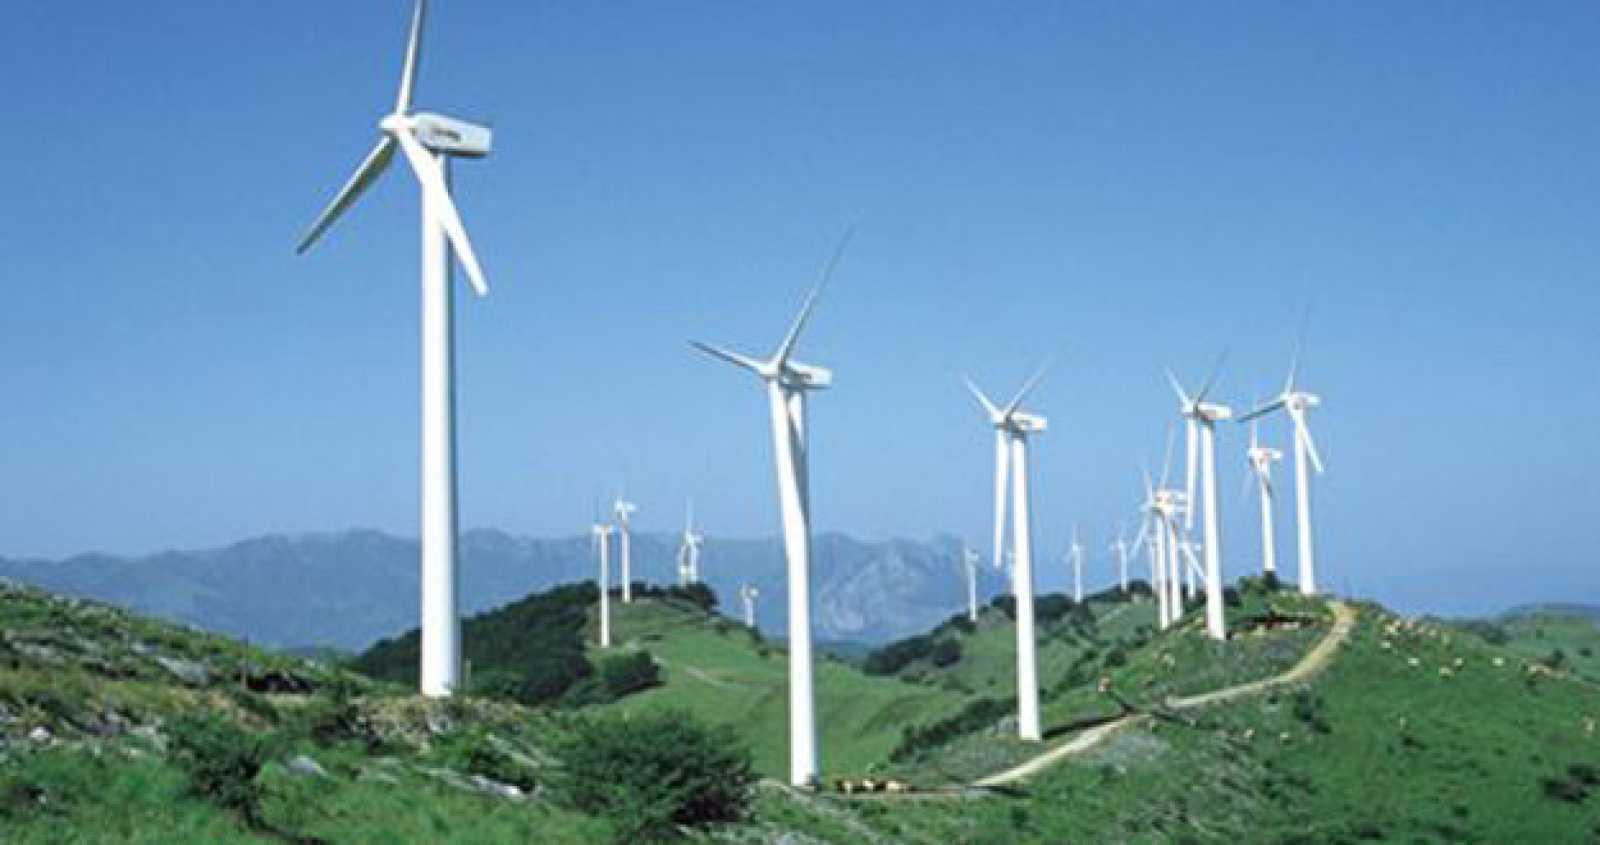 Parque eólico de Leitza en Navarra